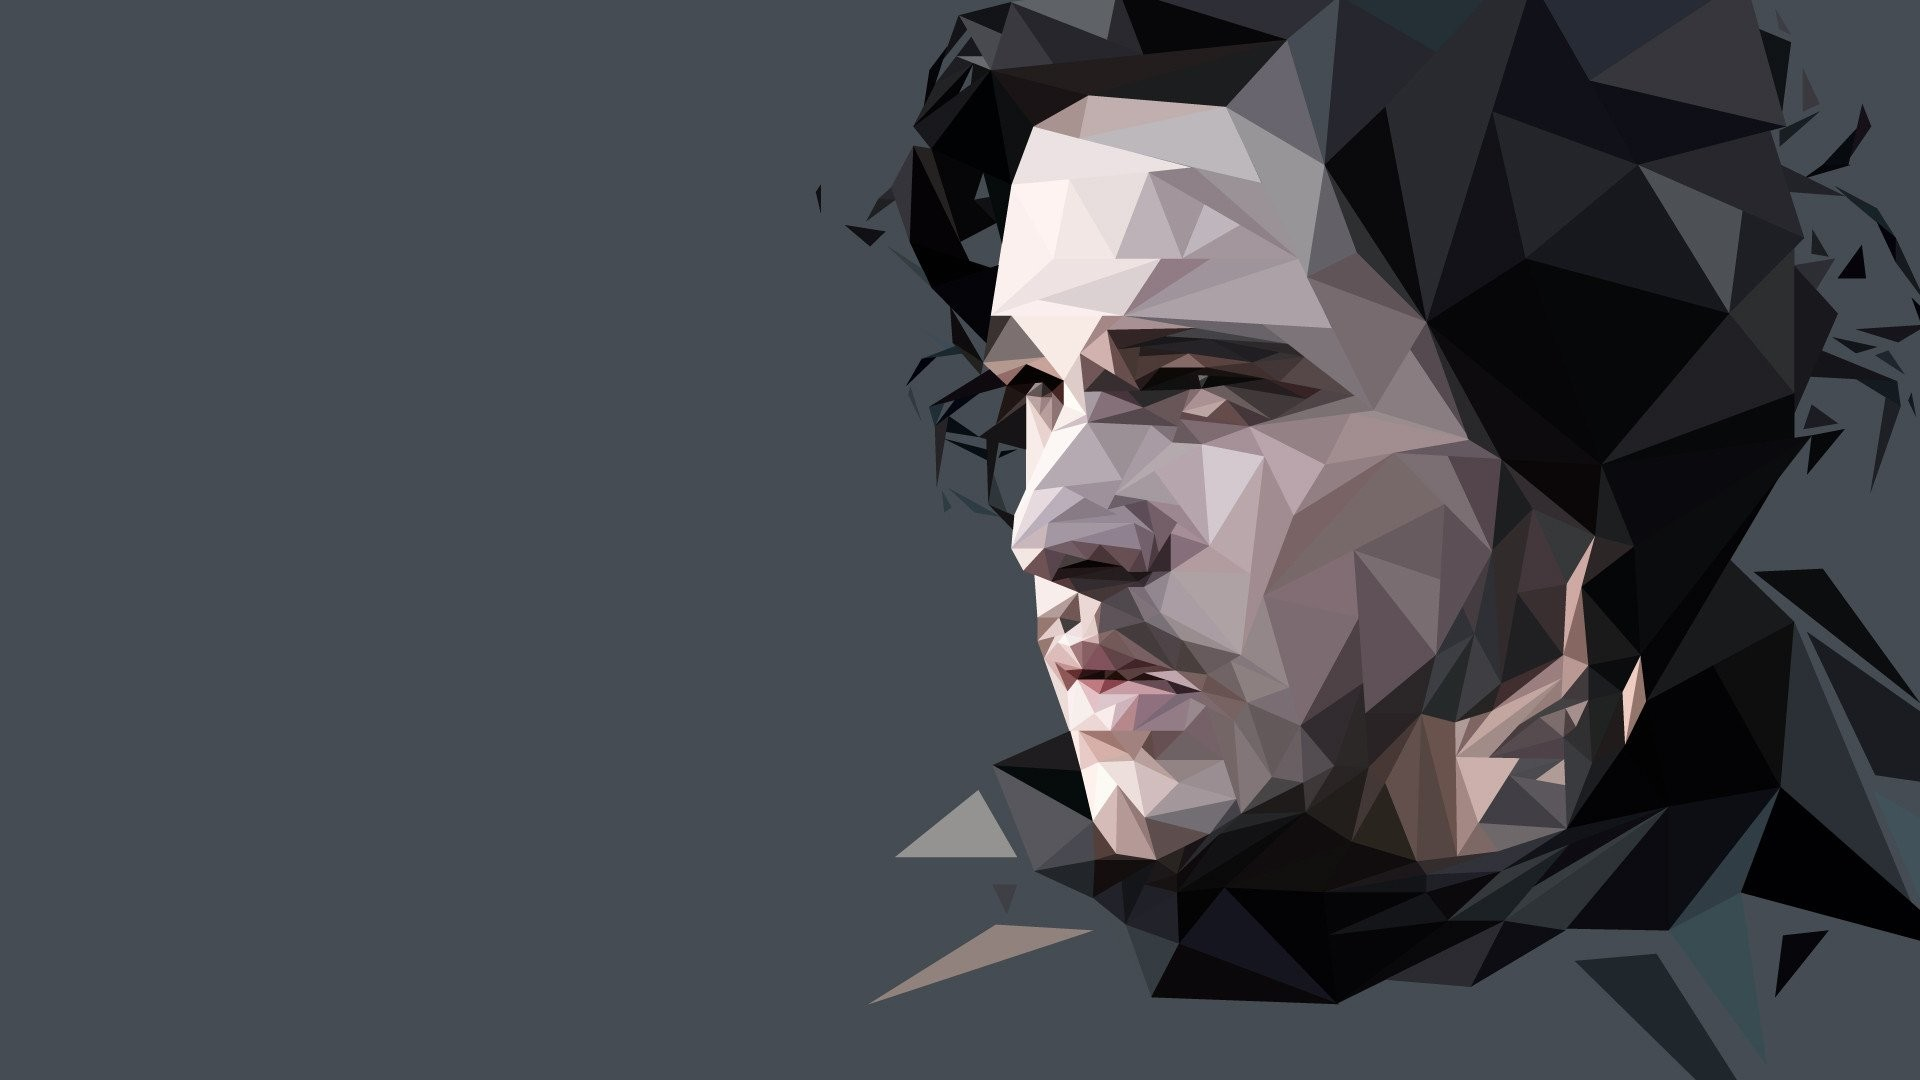 Kit Harington as Jon Snow Wallpapers   HD Wallpapers